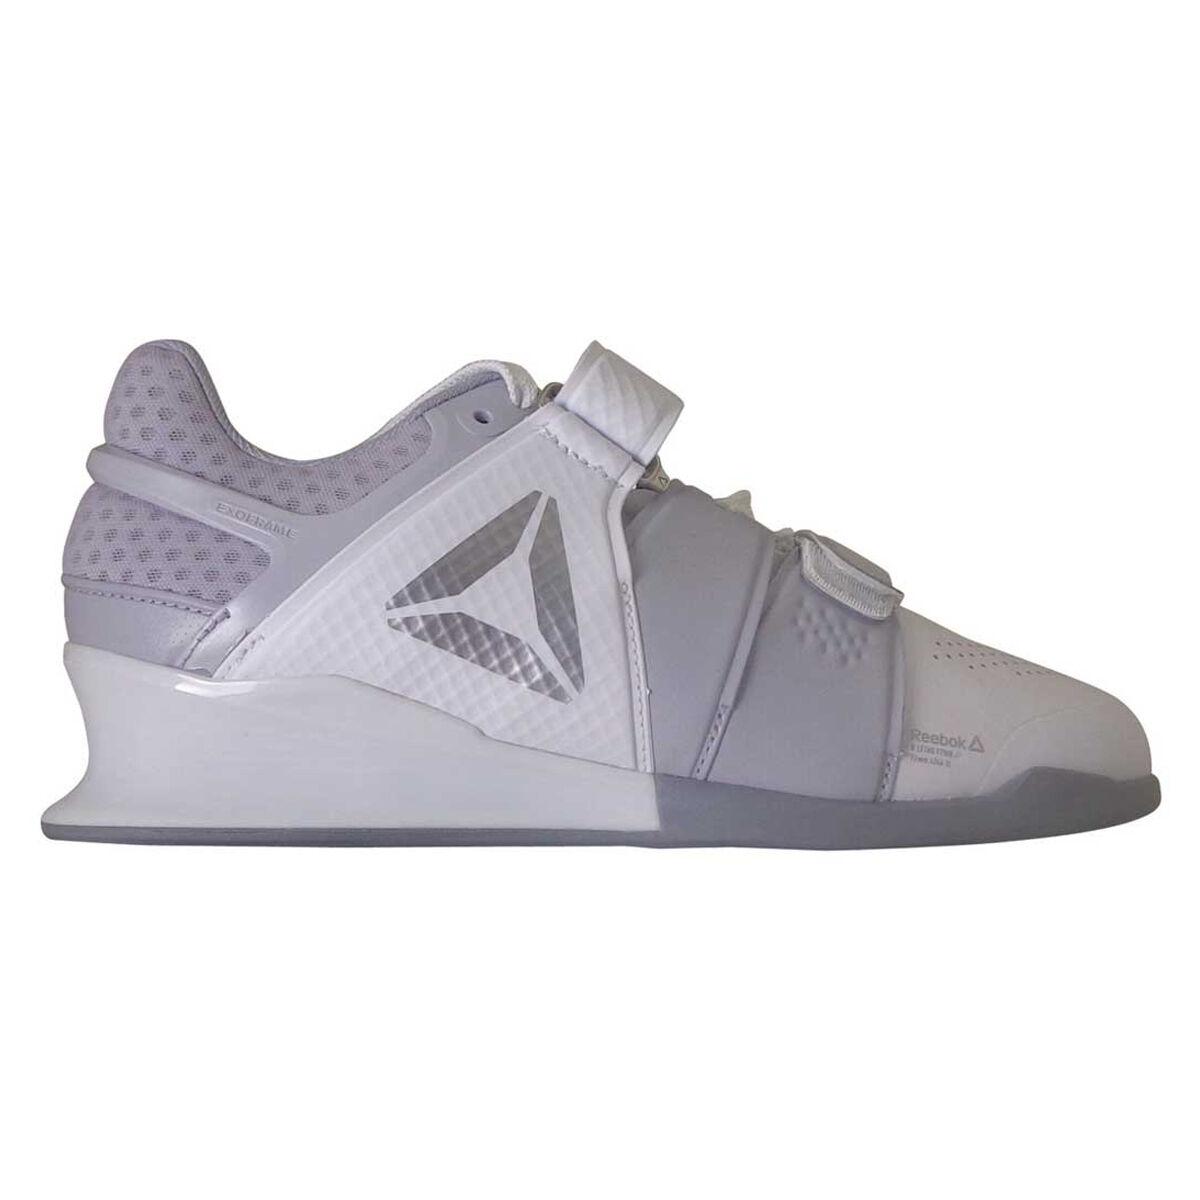 Reebok Legacy Lifter Womens Training Shoes